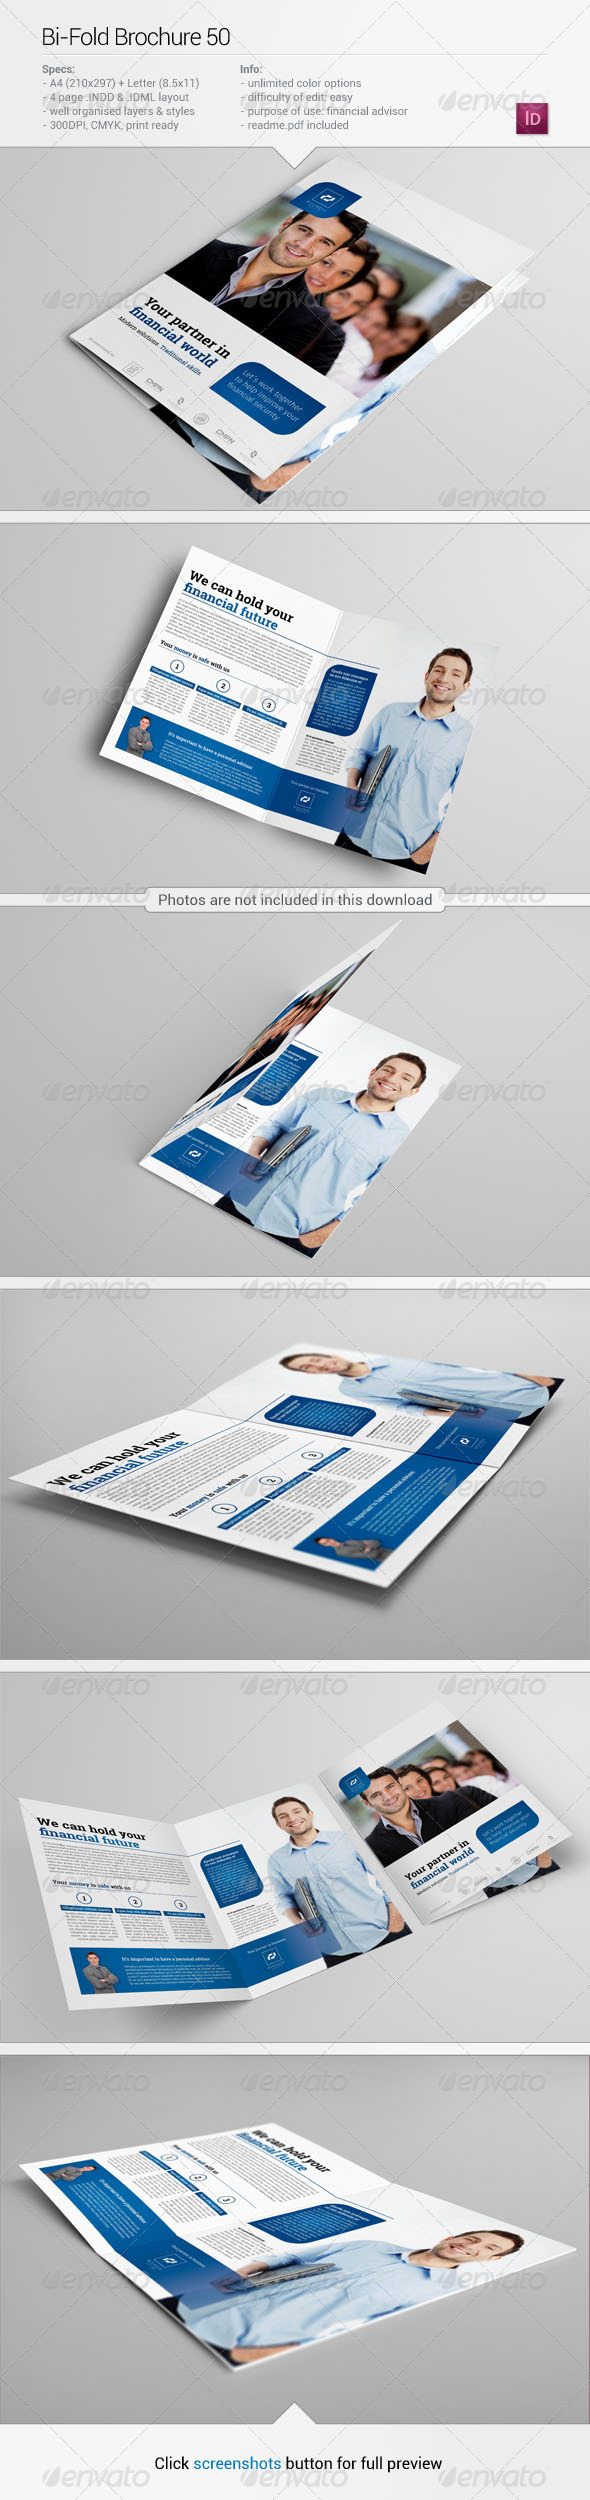 Bi-Fold Brochure 50 - Corporate Brochures